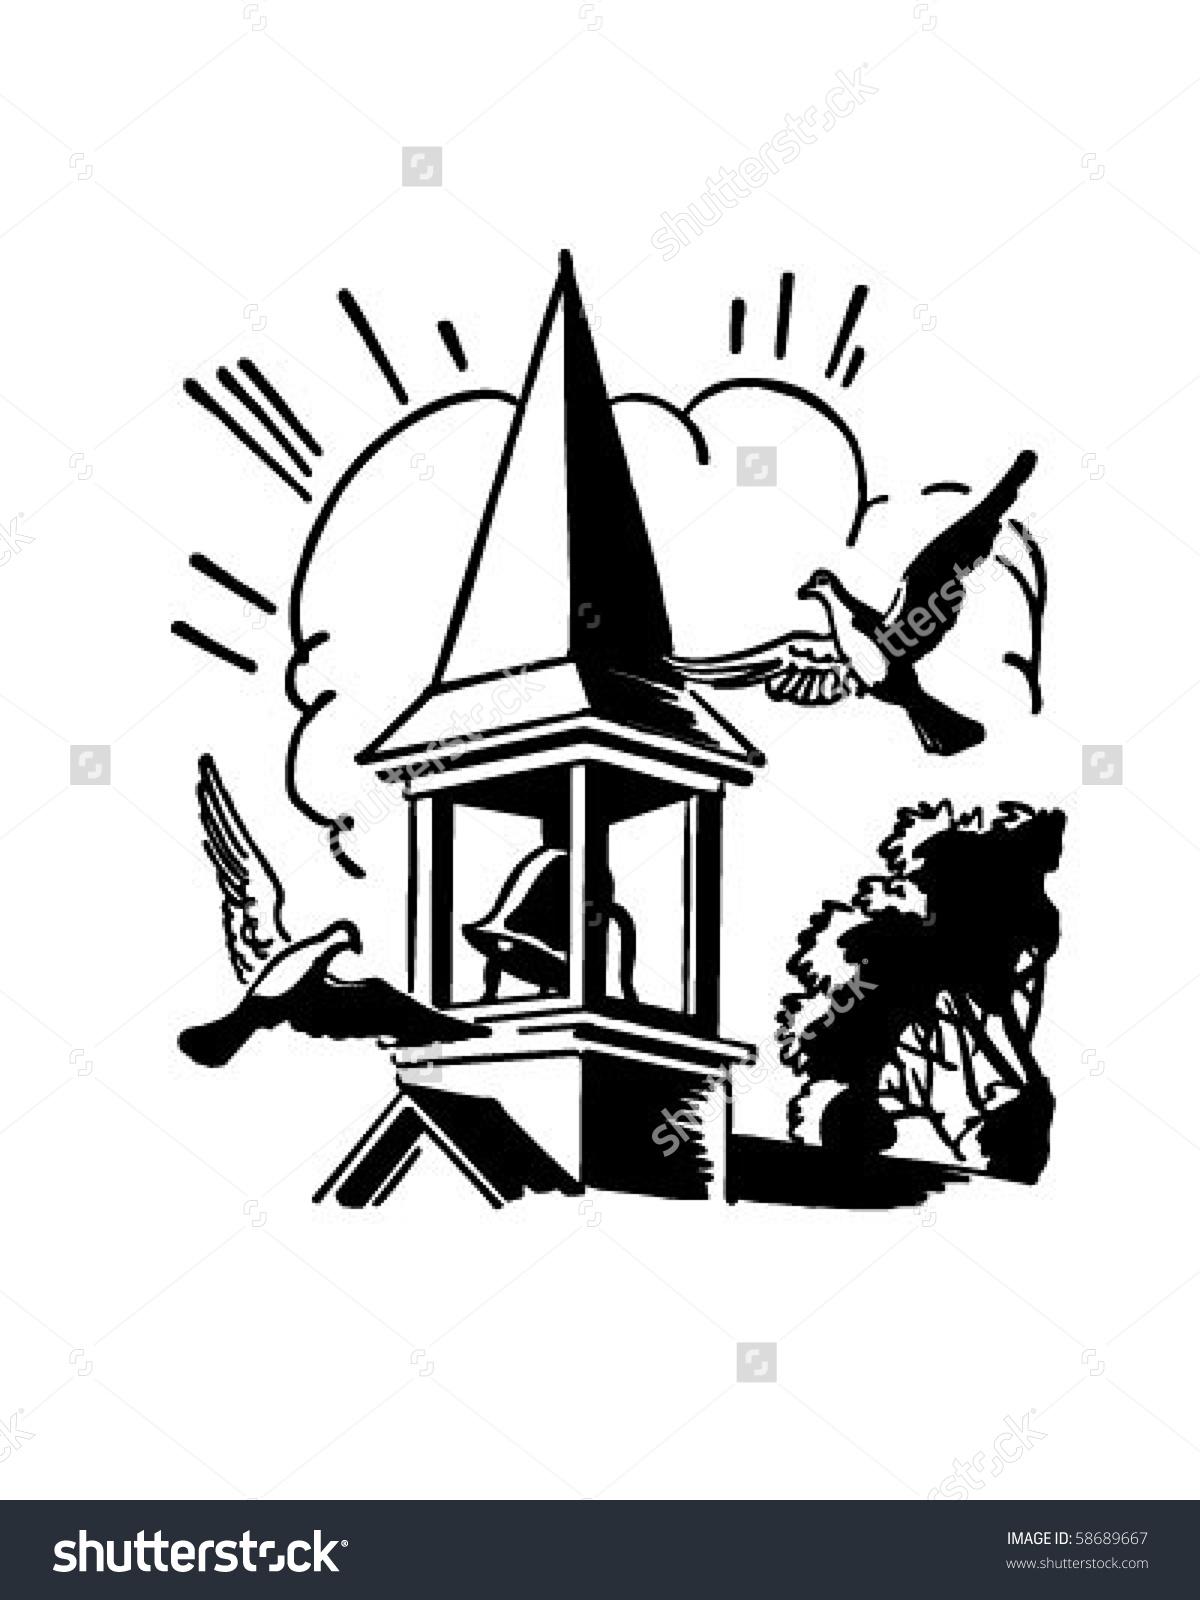 Bells clipart vector. Ringing church bell paberish